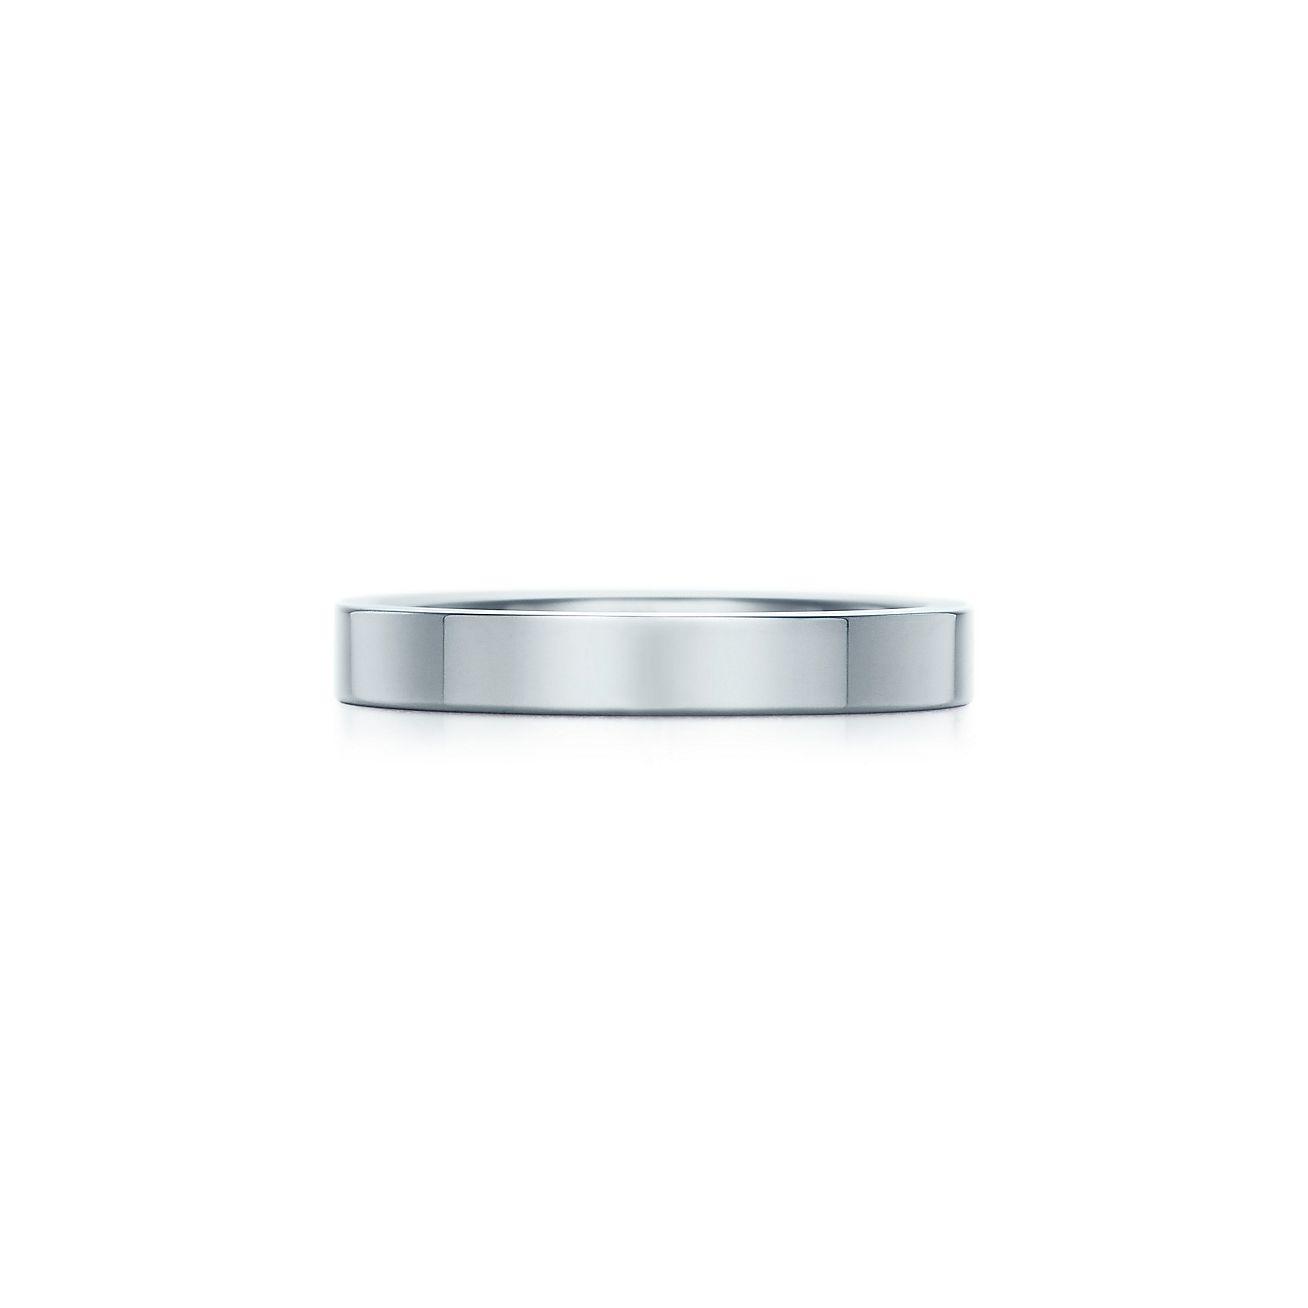 Marvelous Tiffany Flat Wedding Band Ring In Platinum, 3 Mm Wide. | Tiffany U0026 Co.